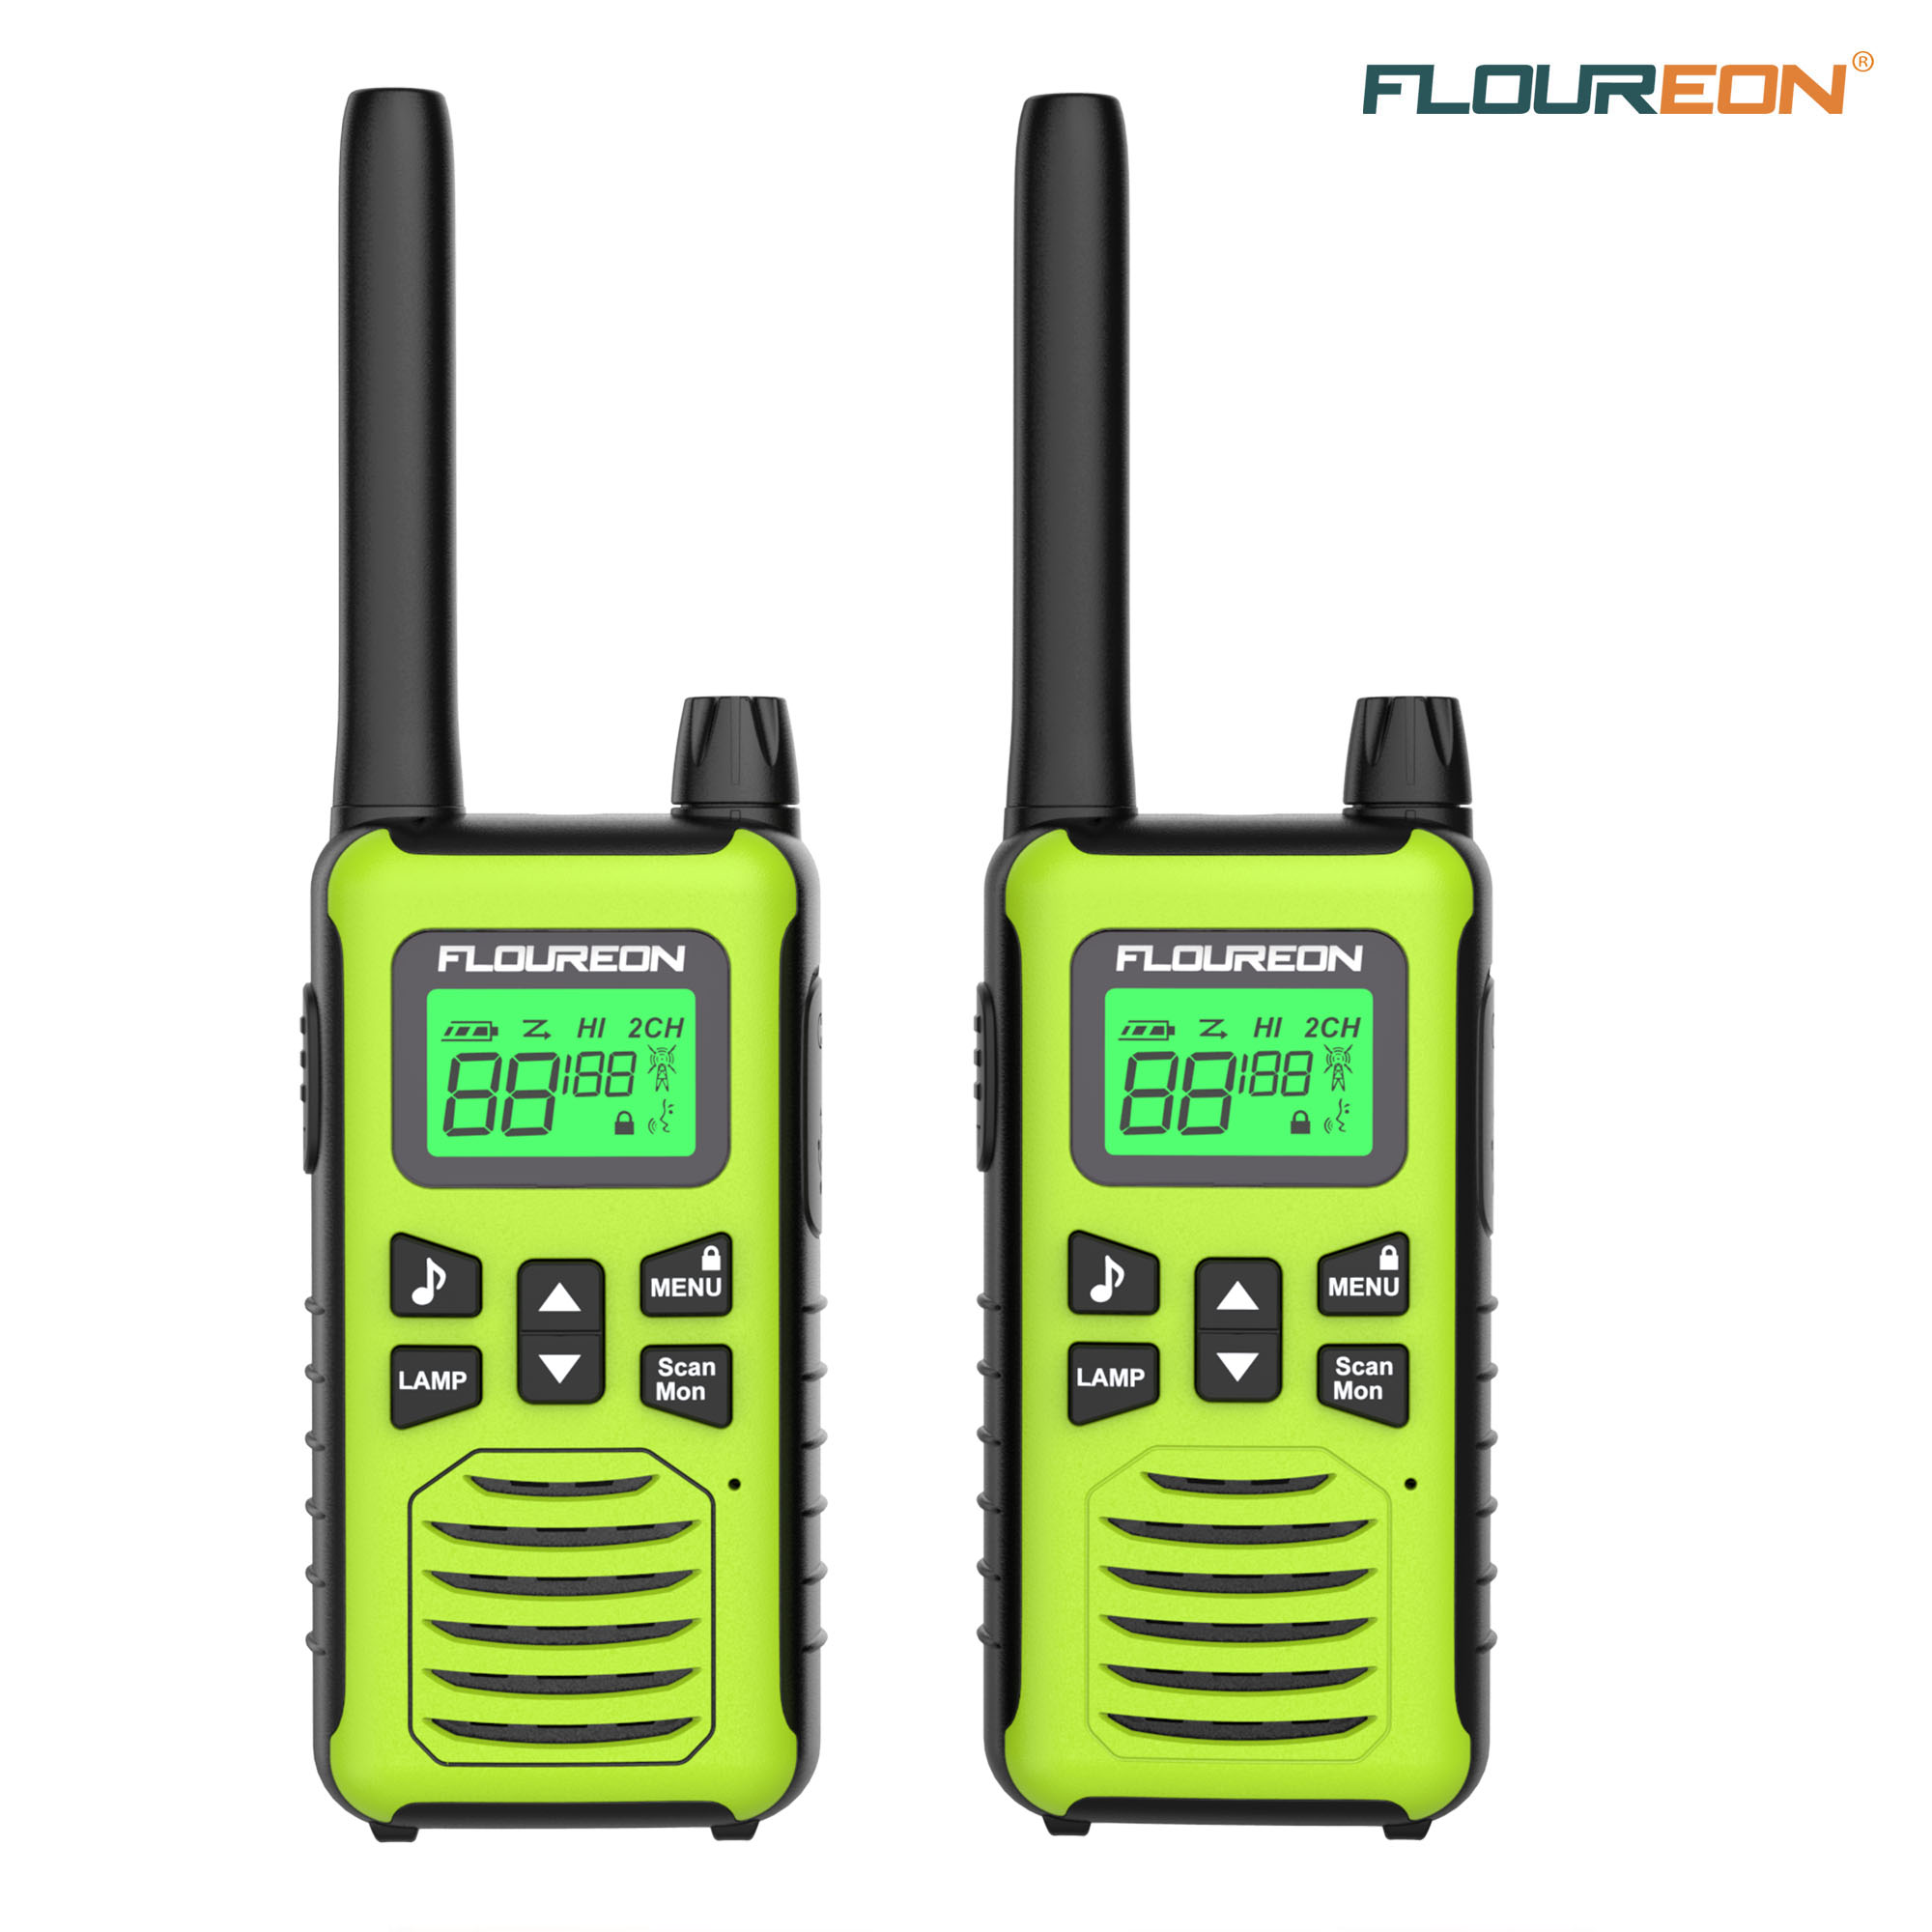 2x 22 Channel Walkie Talkie 2-Way Radio Handheld Interphone Long Range Up to 5km